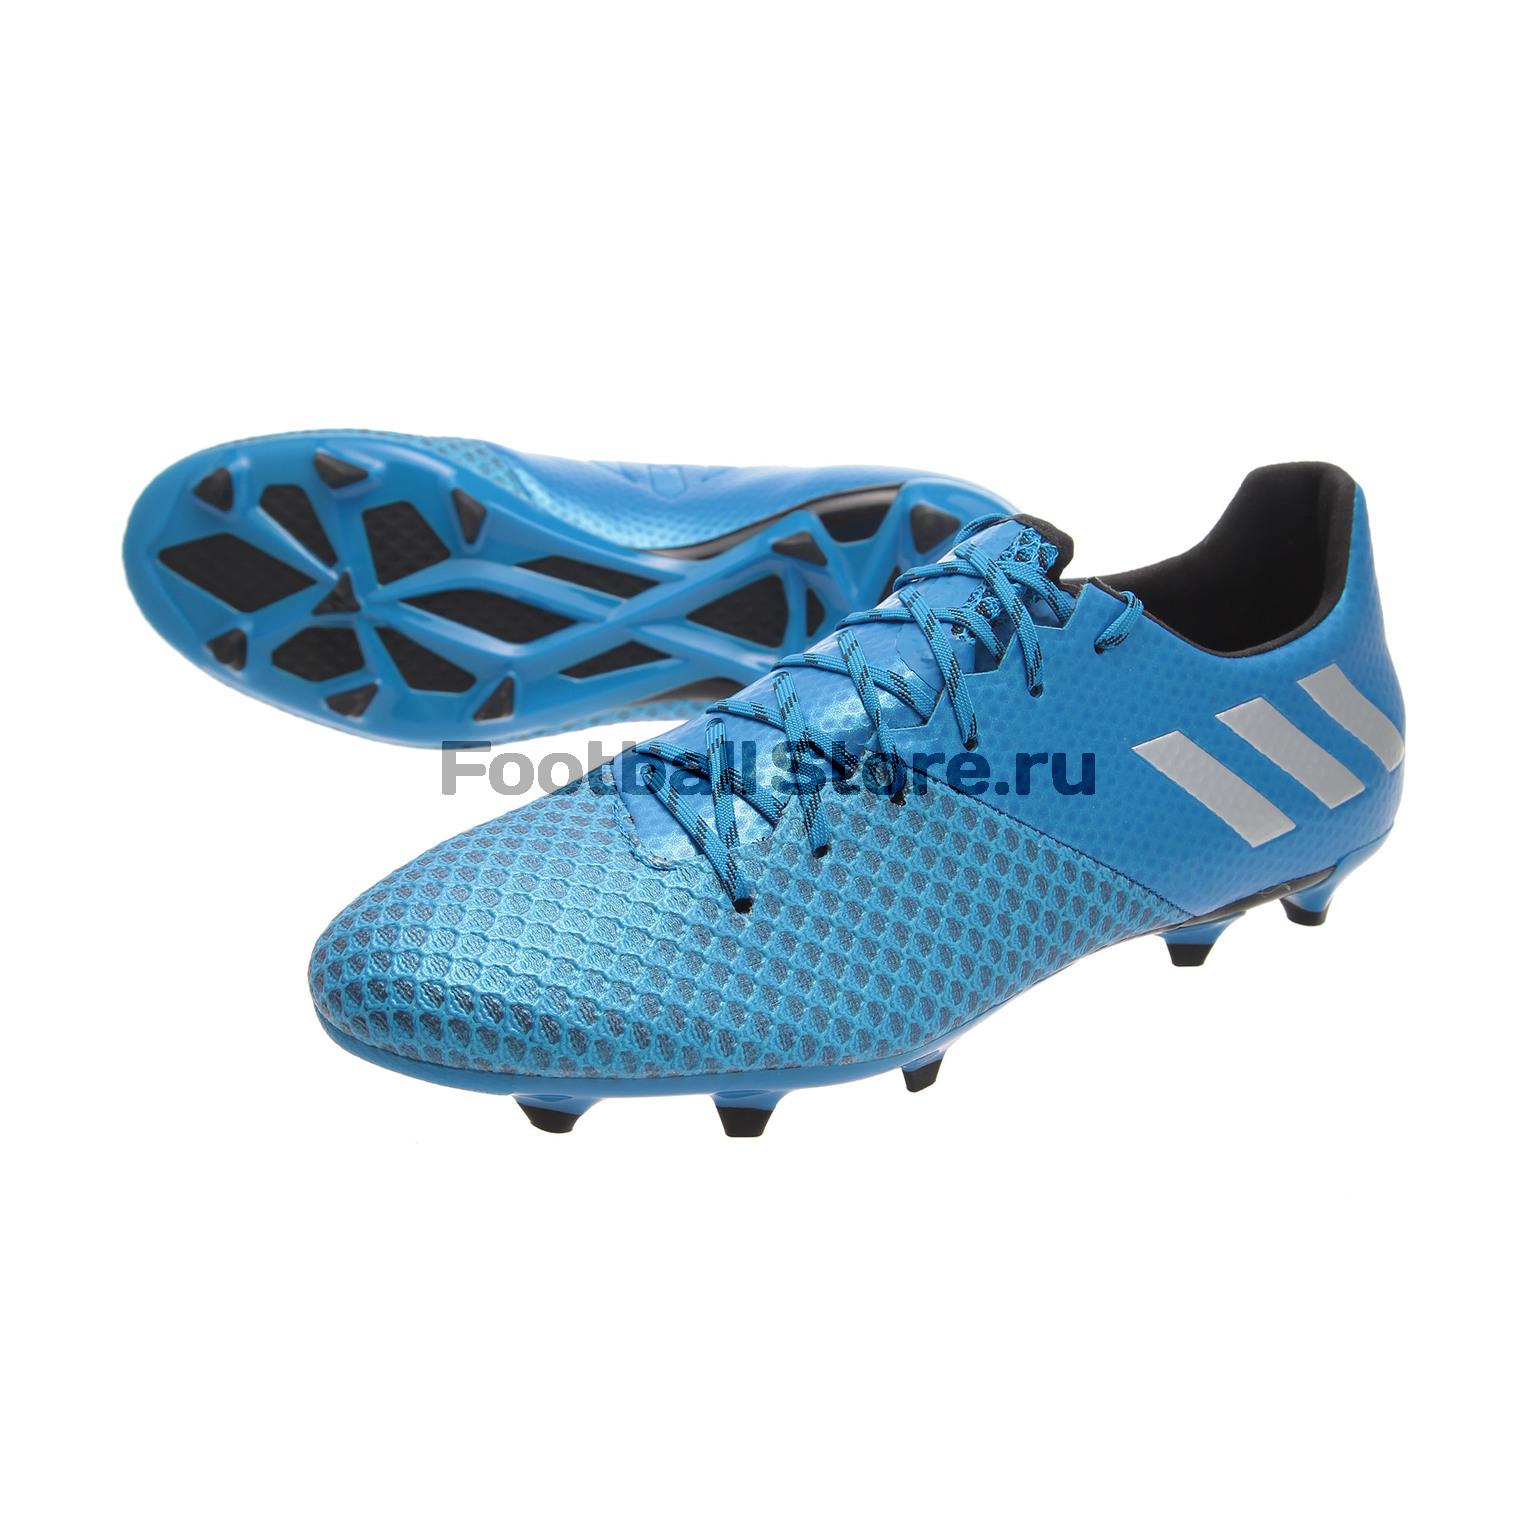 цены Бутсы Adidas Messi 16.2 FG AQ3111